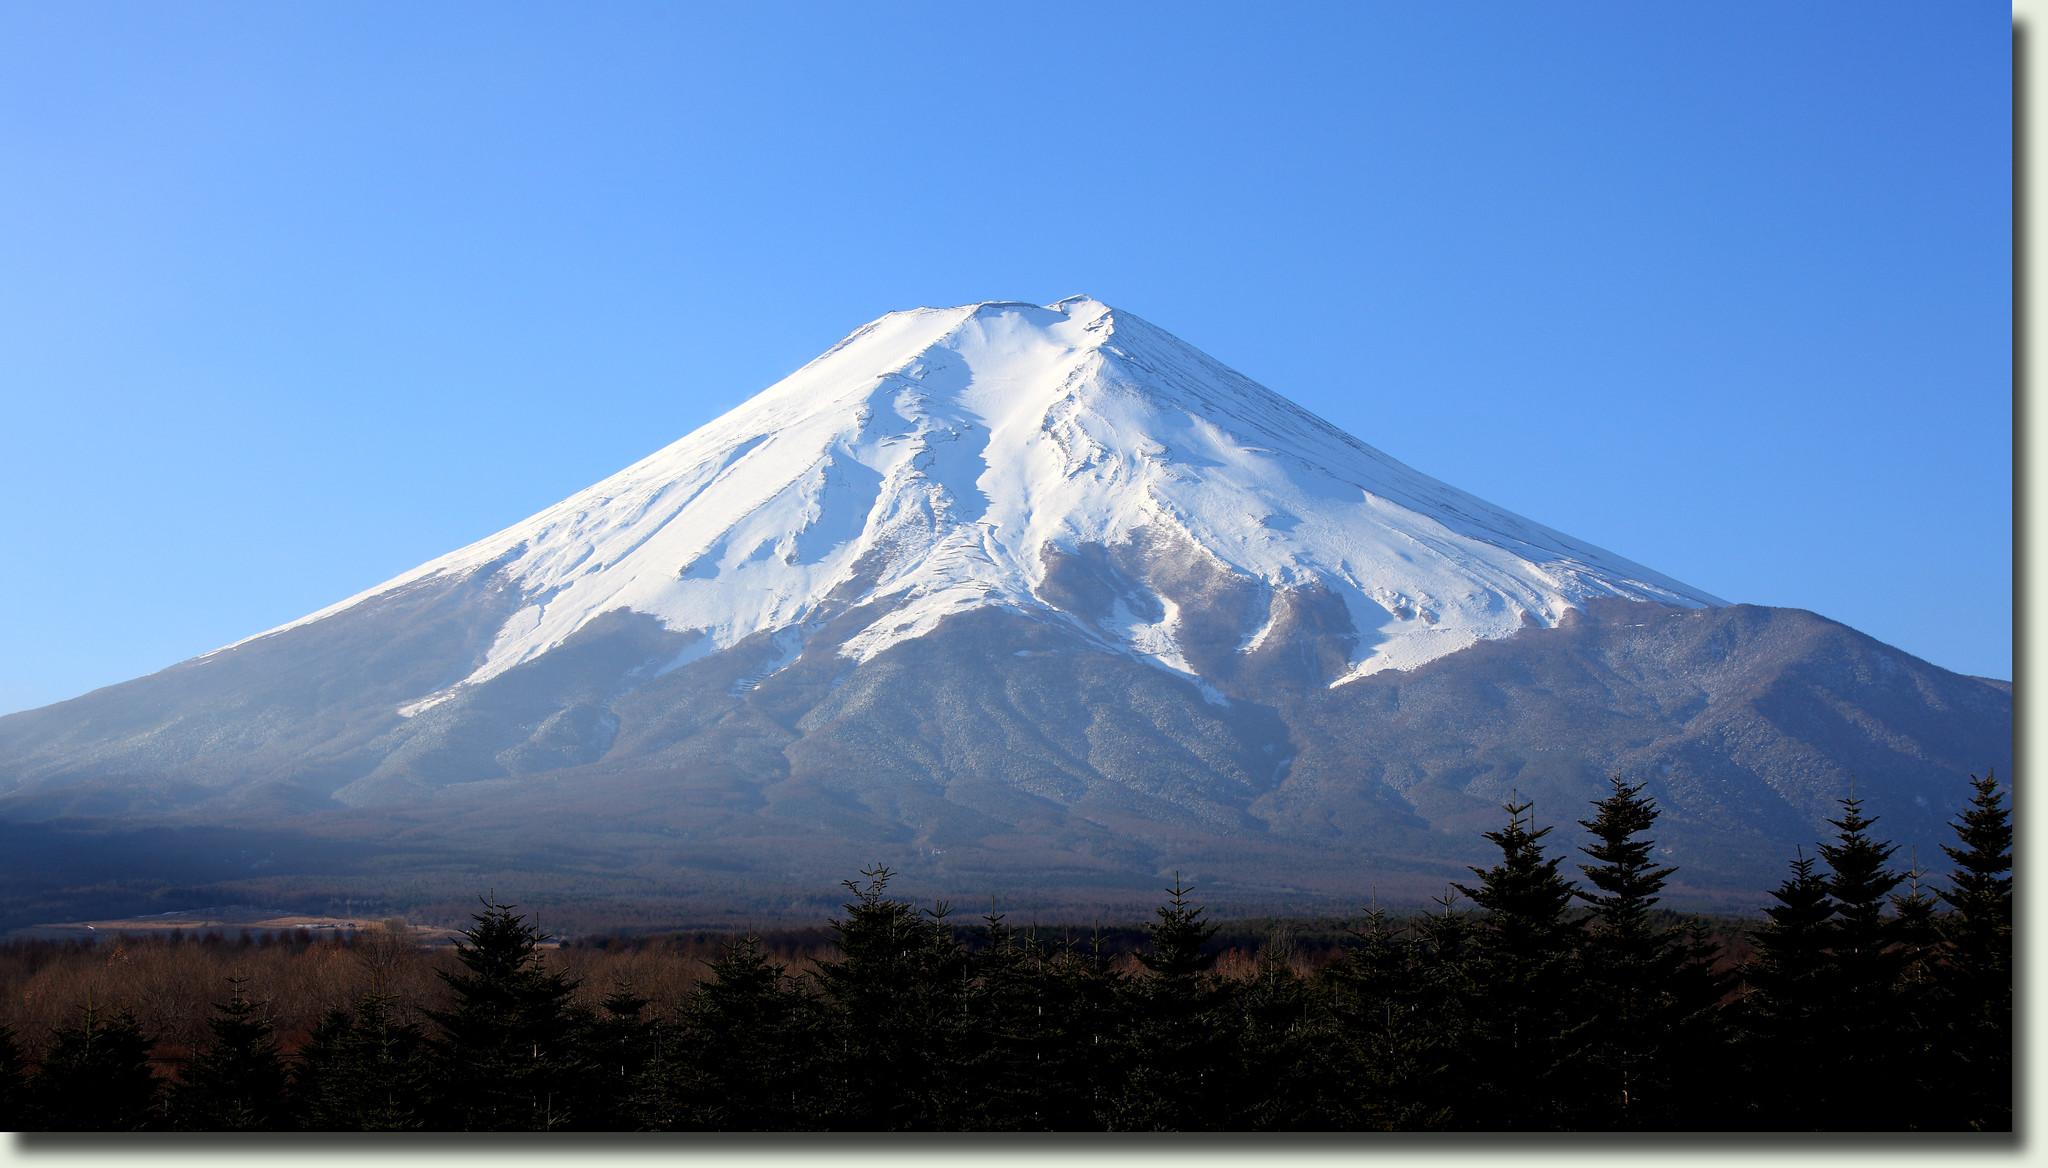 Idrogeno, a Chubu in Giappone nasce l'energia del 2030